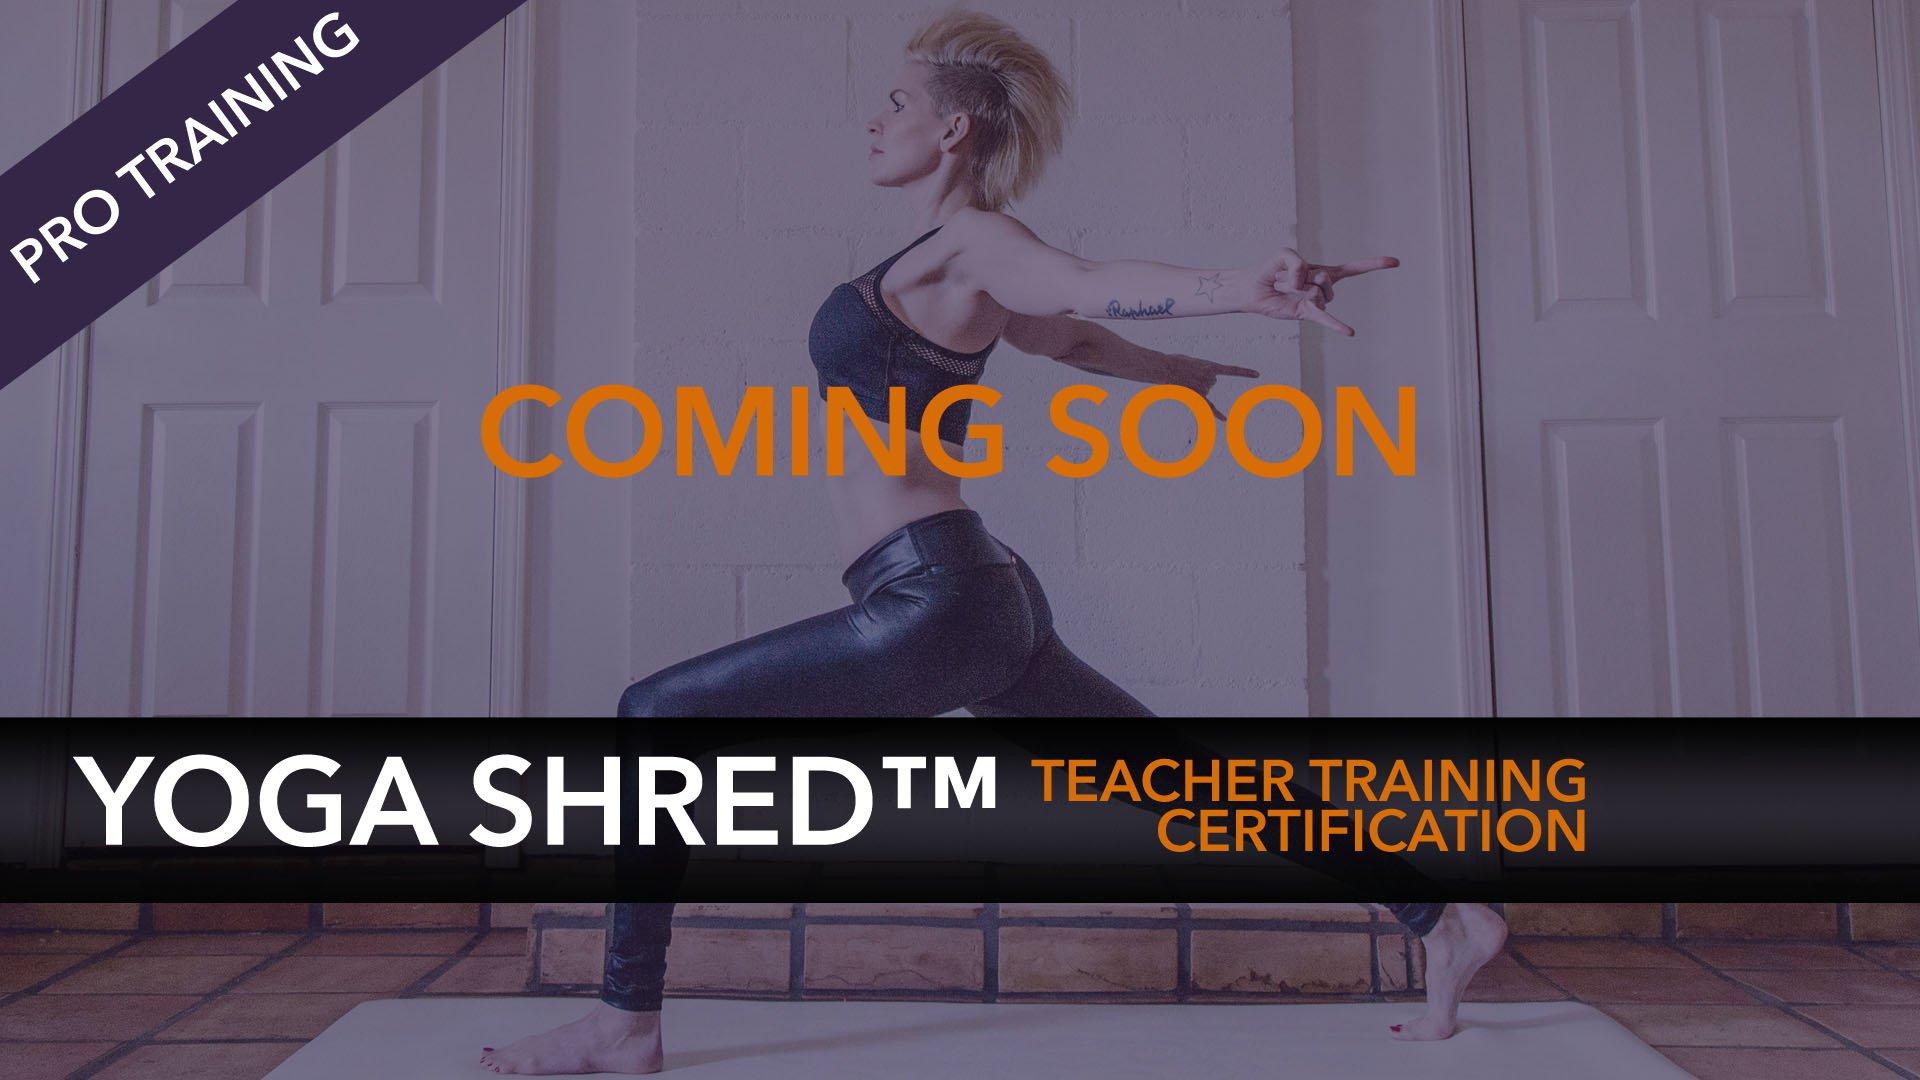 Yoga Shred Teacher Training Certification Notification